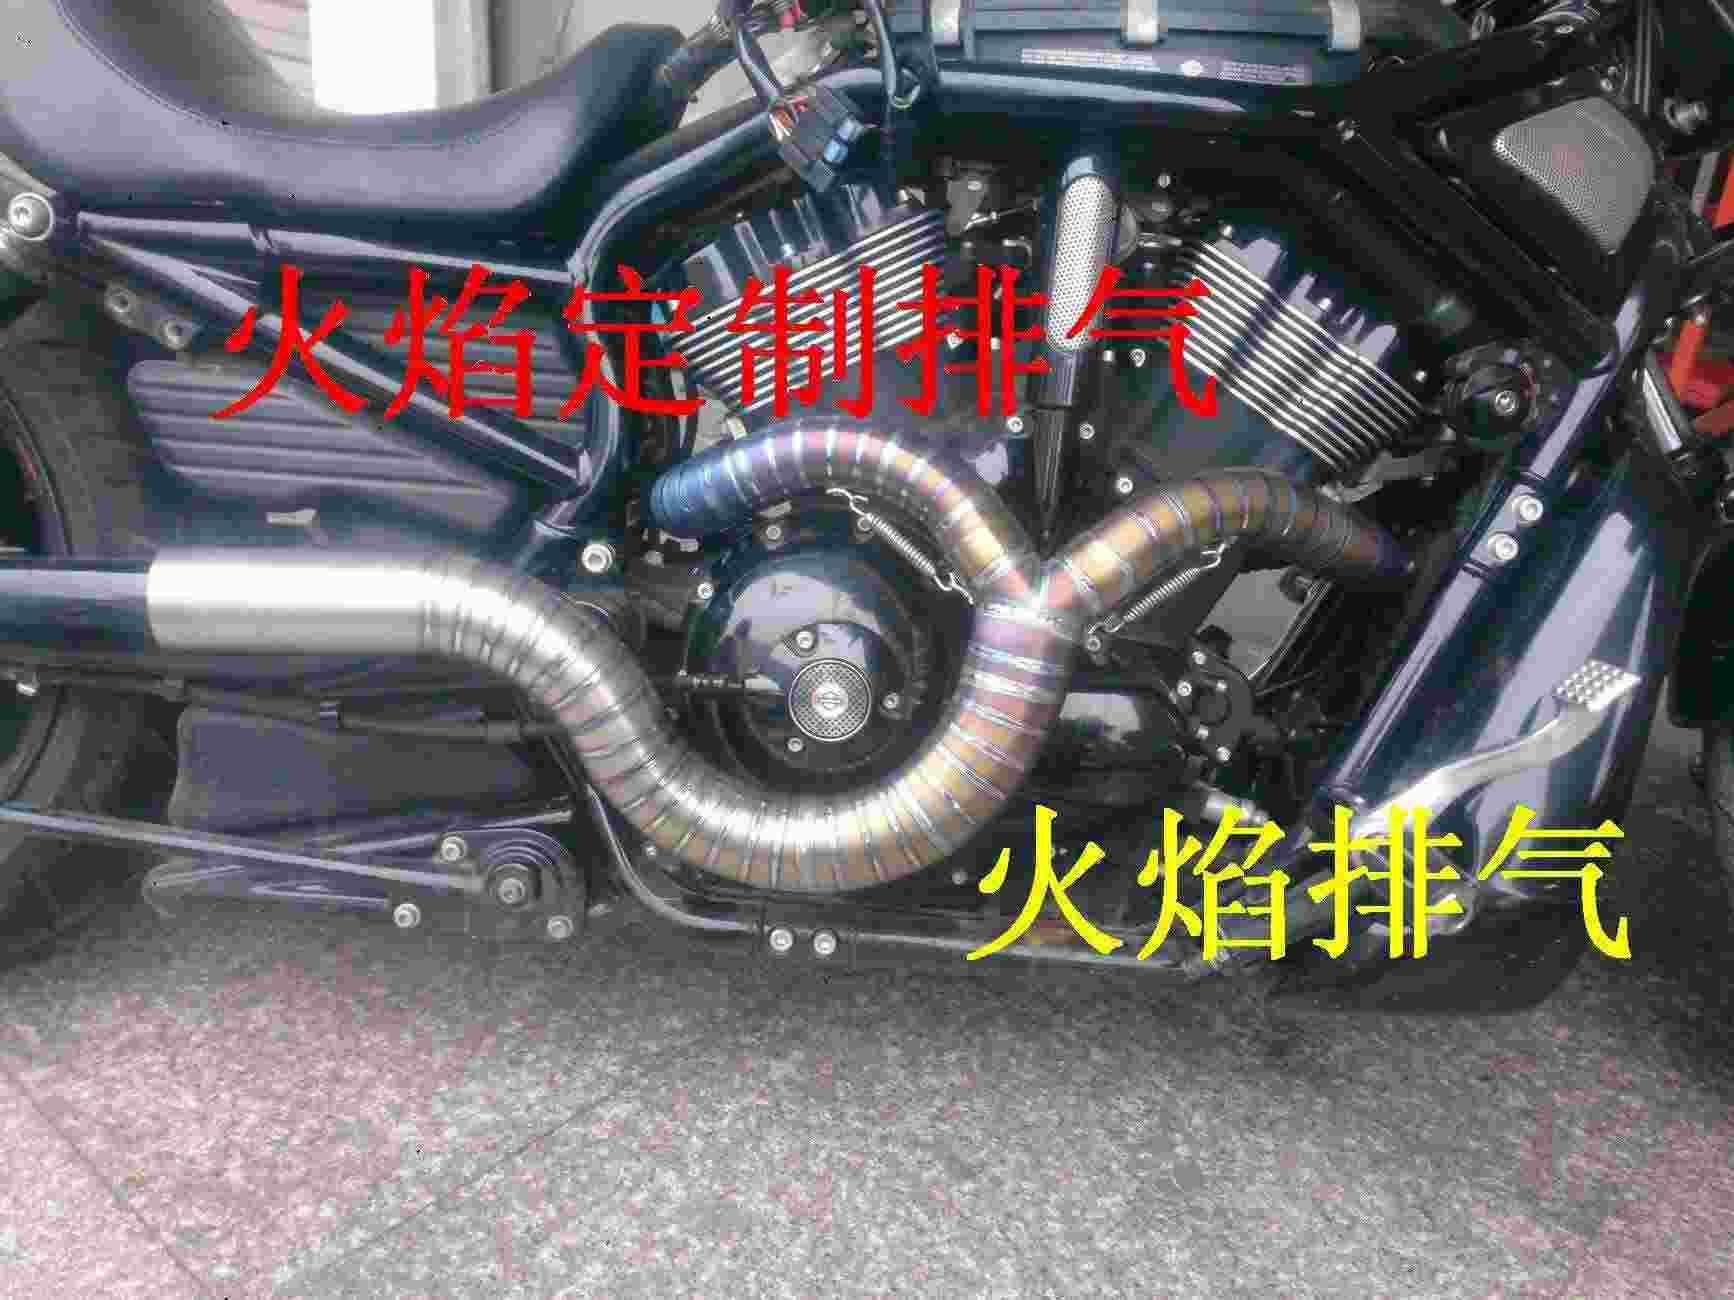 2021 all handmade custom exhaust flame